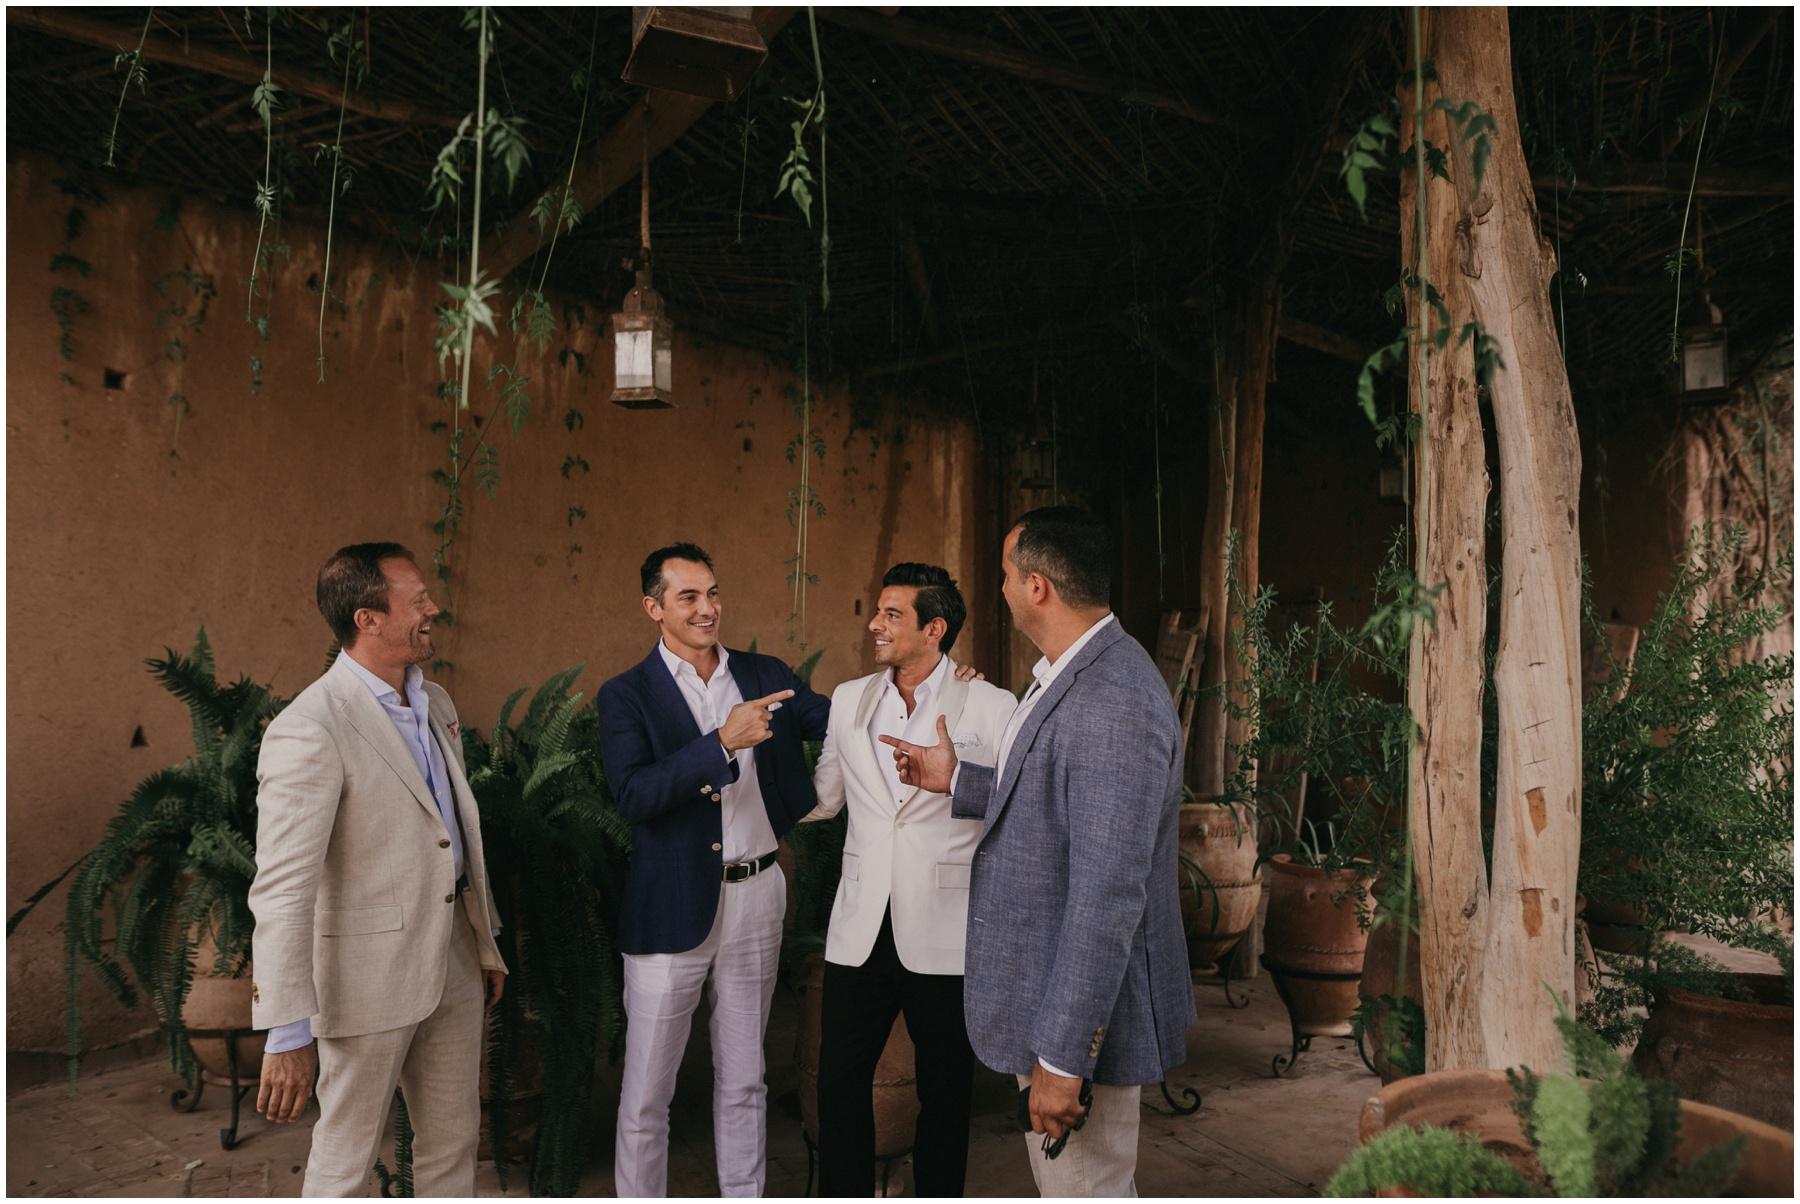 Marrakech Wedding Beldi Coutry Club 012.JPG